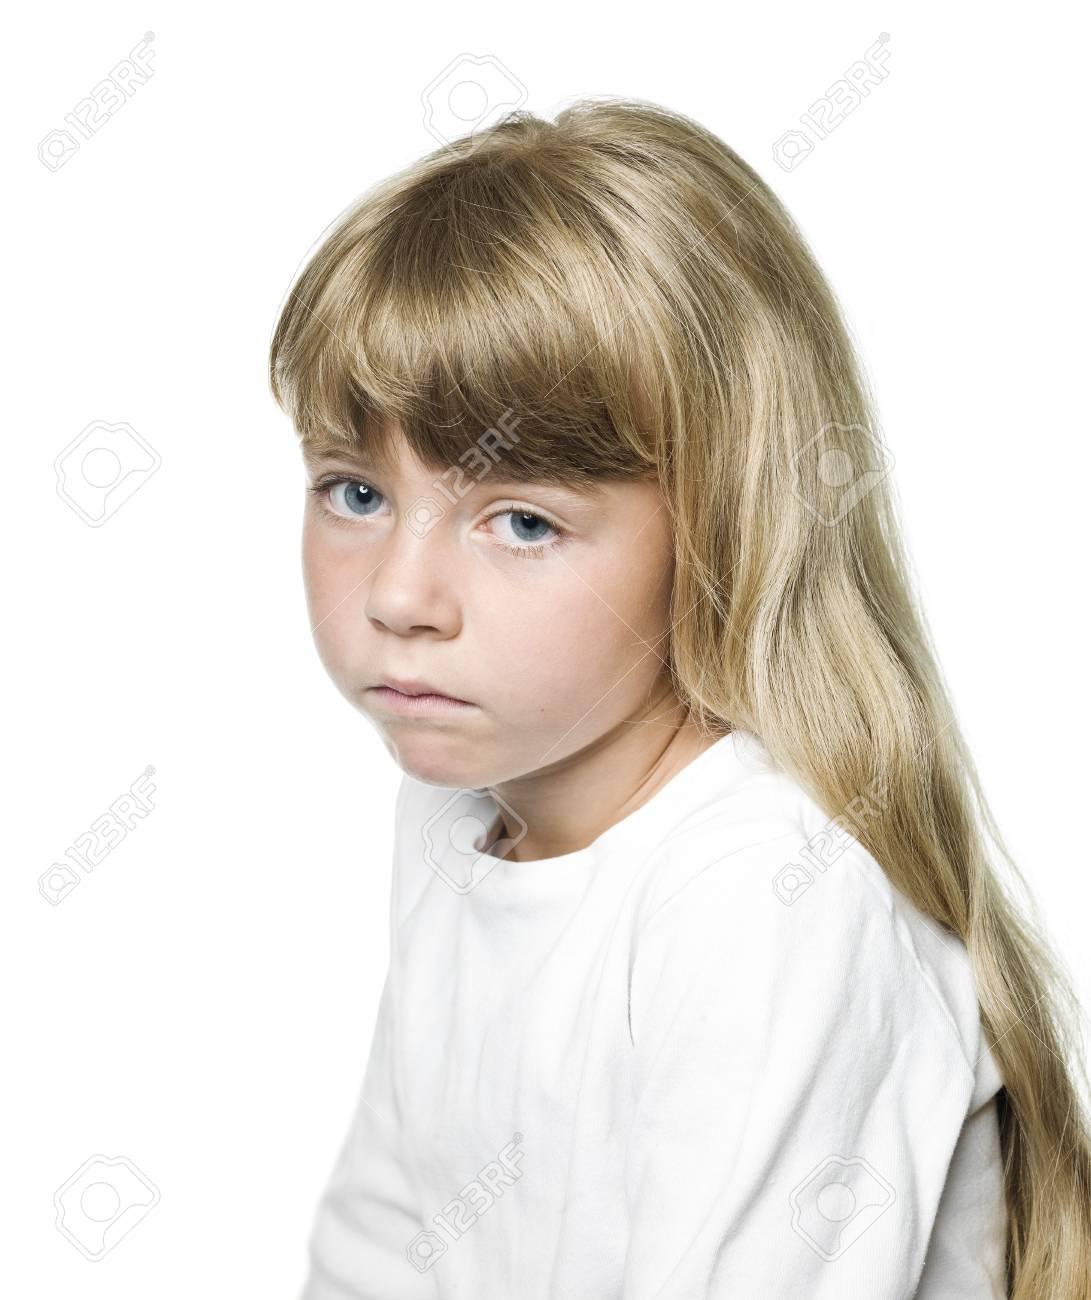 Portrait of a Sad girl on white background Stock Photo - 14767913